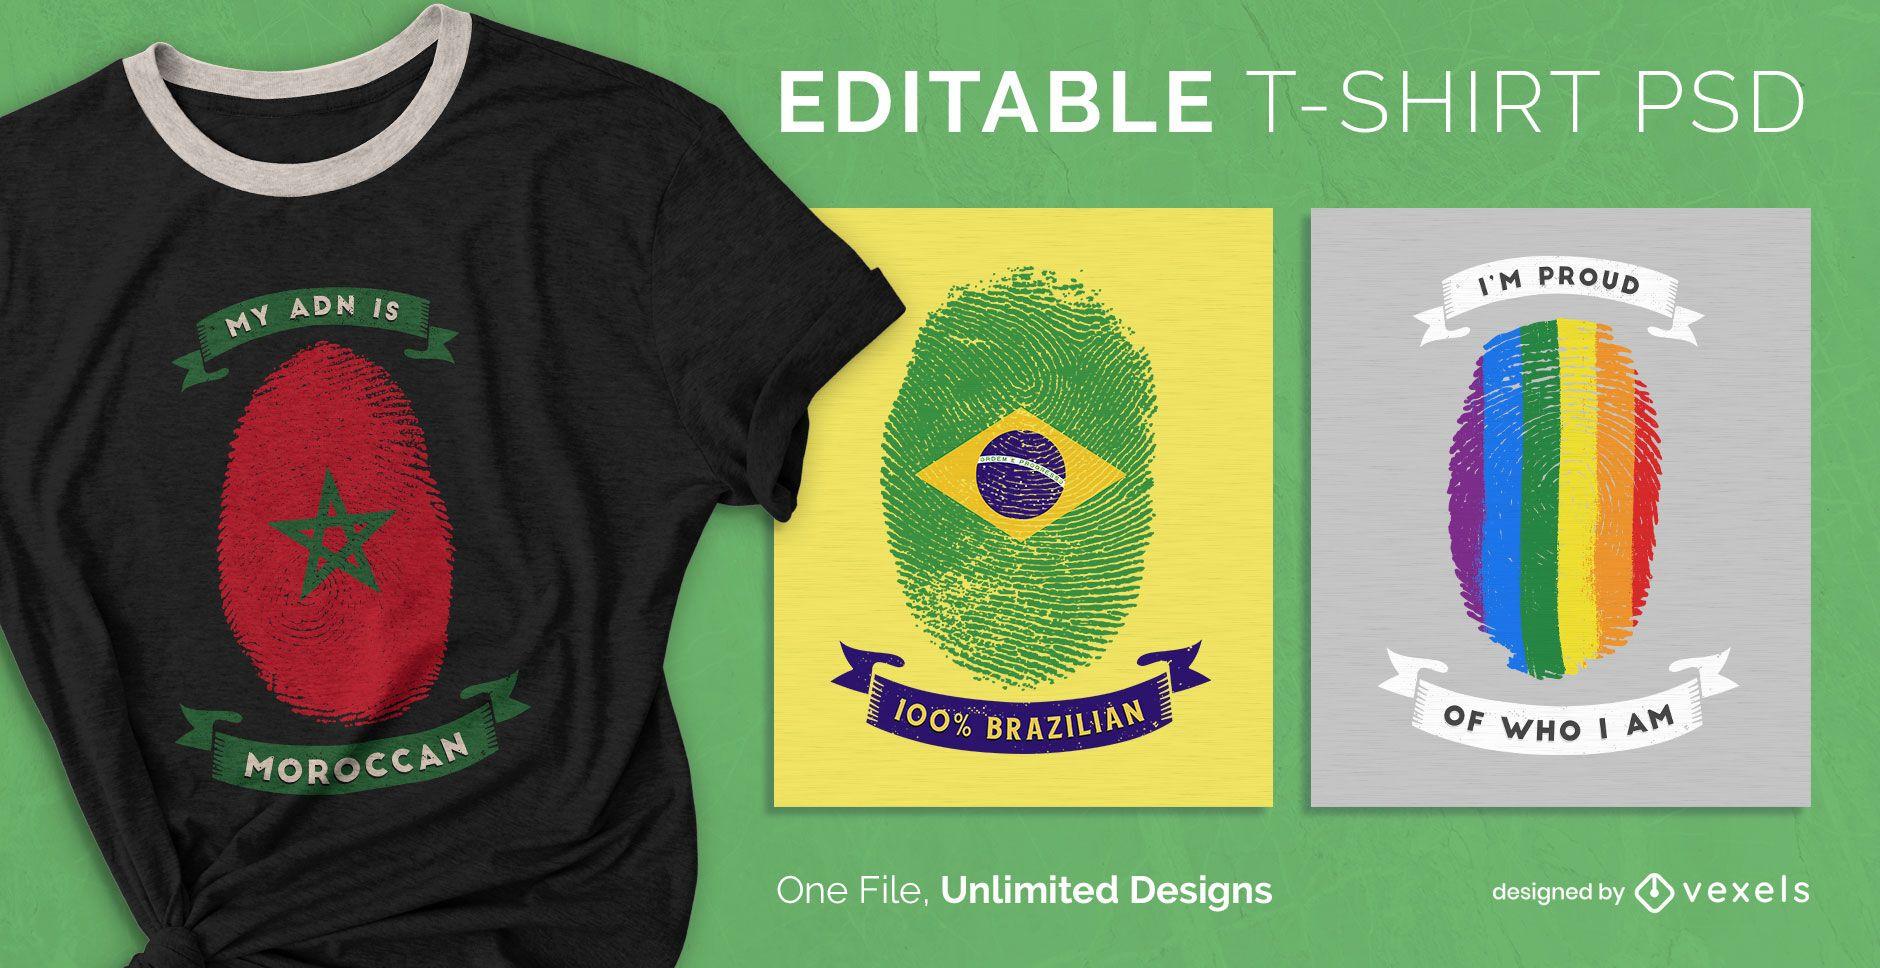 Camiseta escalable huella digital psd